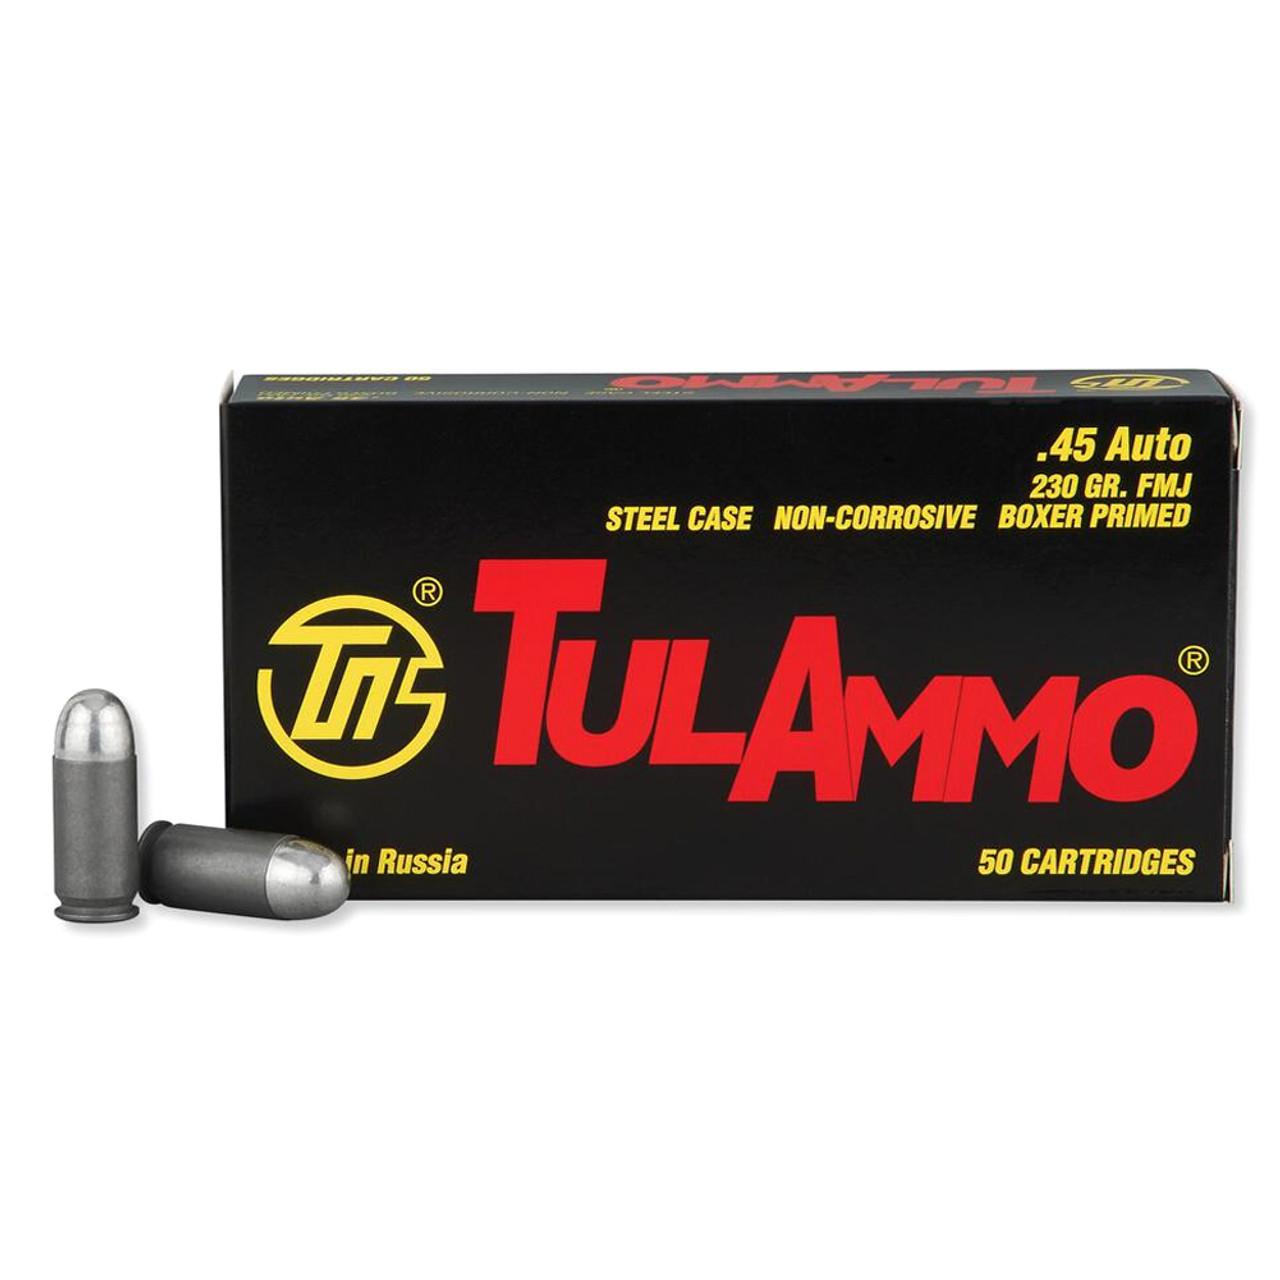 TULAMMO Steel Cased 45 ACP 230 Grain FMJ Ammo, 50 Round Box (TA452300)